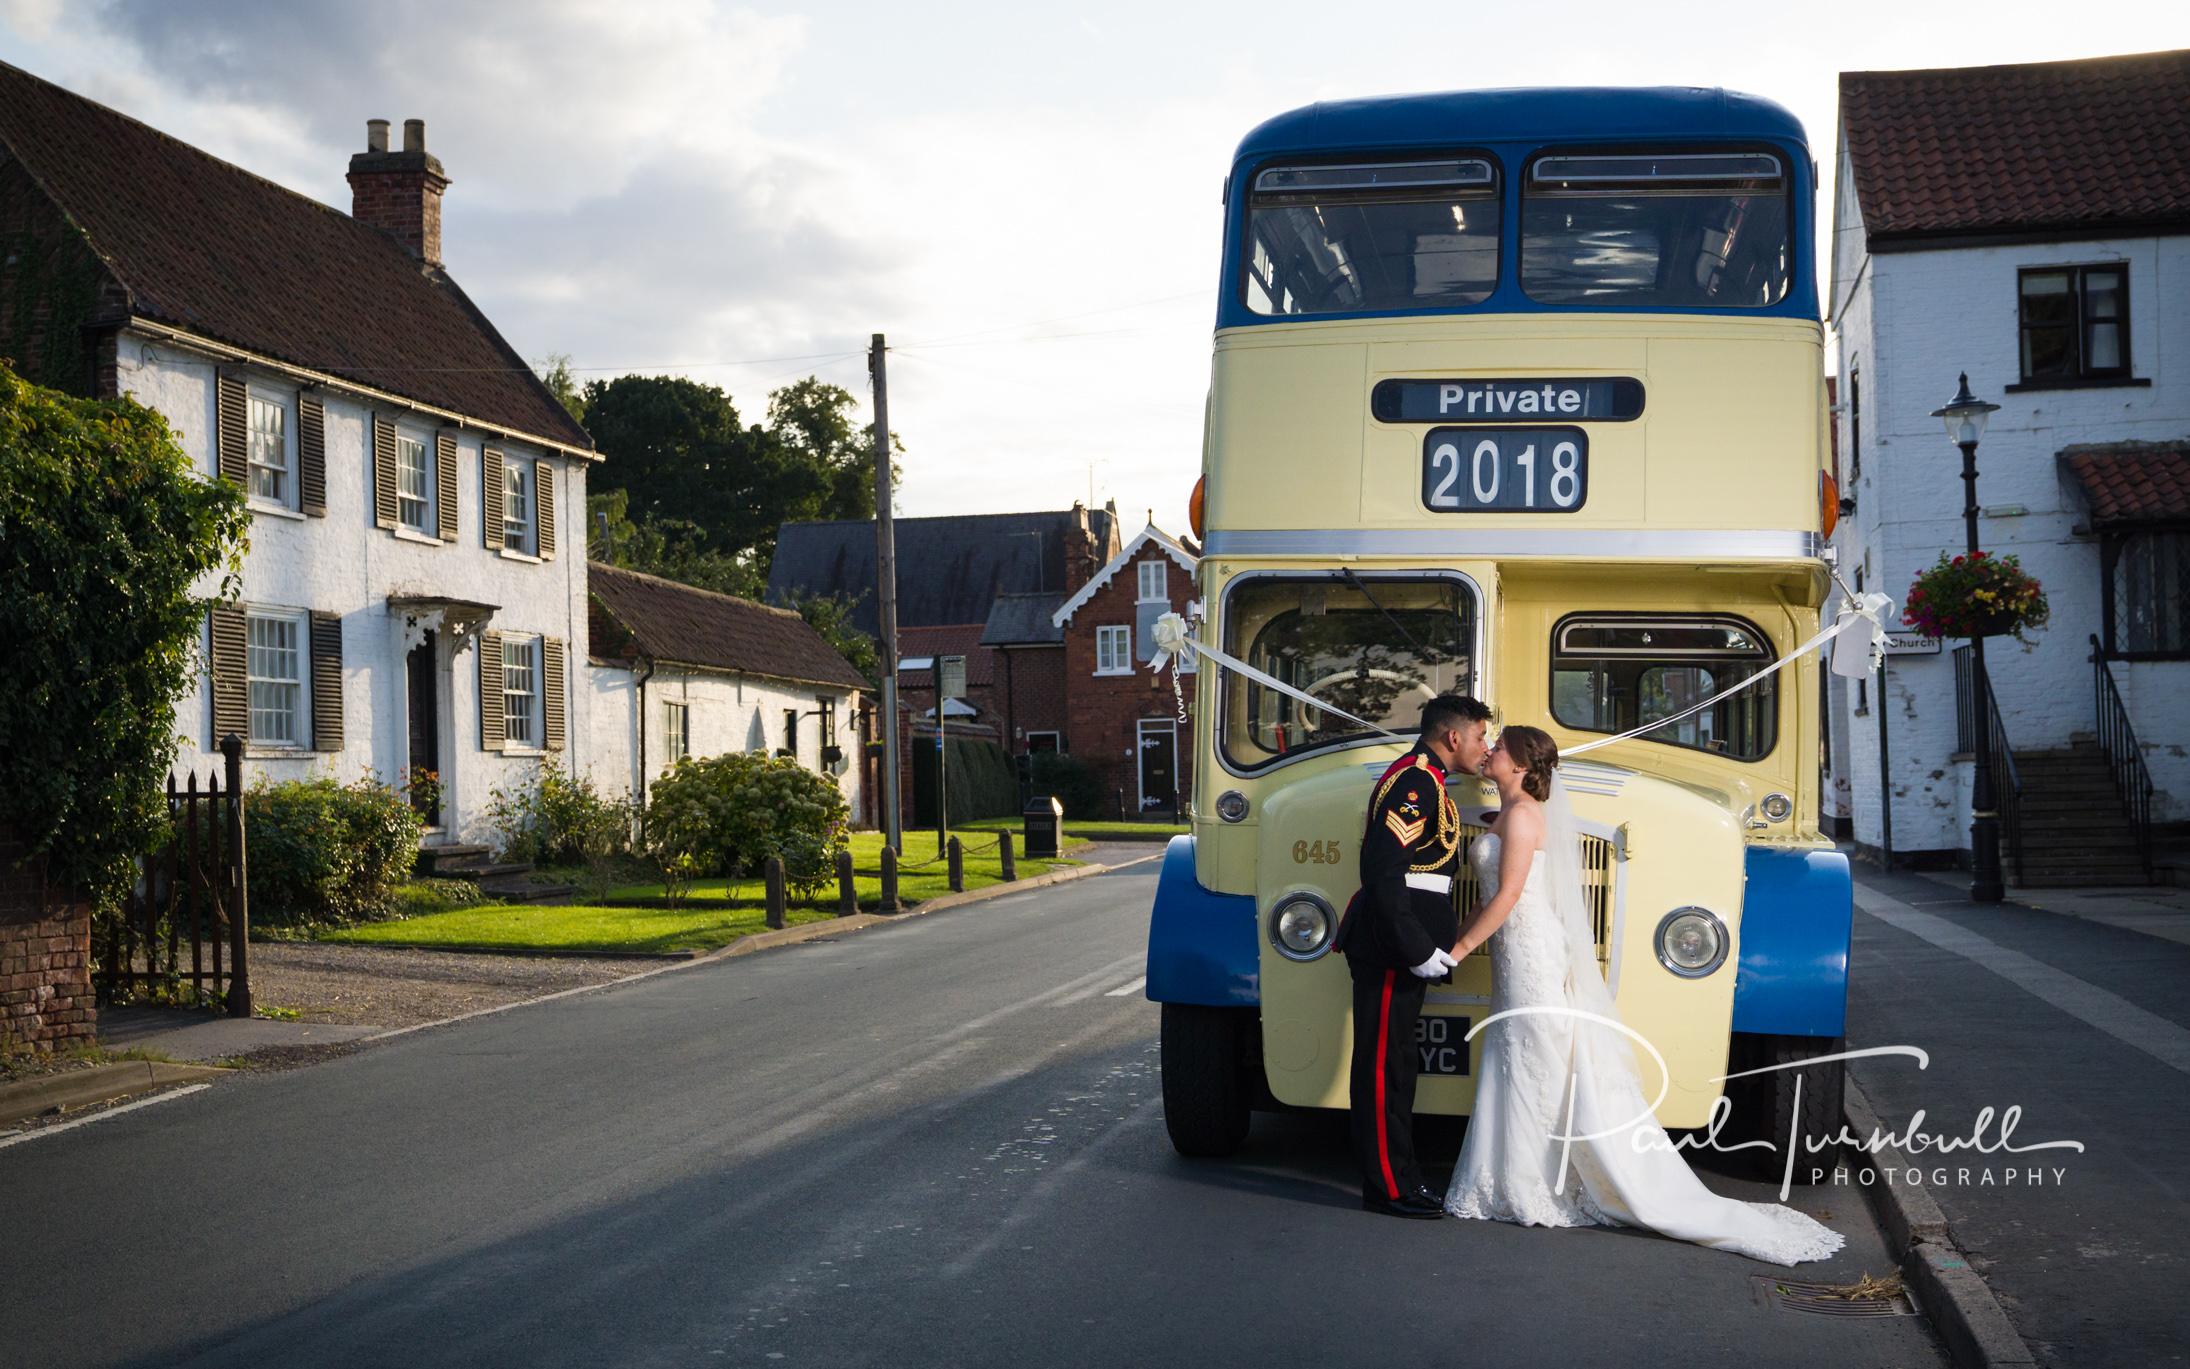 wedding-photographer-south-dalton-walkington-yorkshire-emma-james-069.jpg